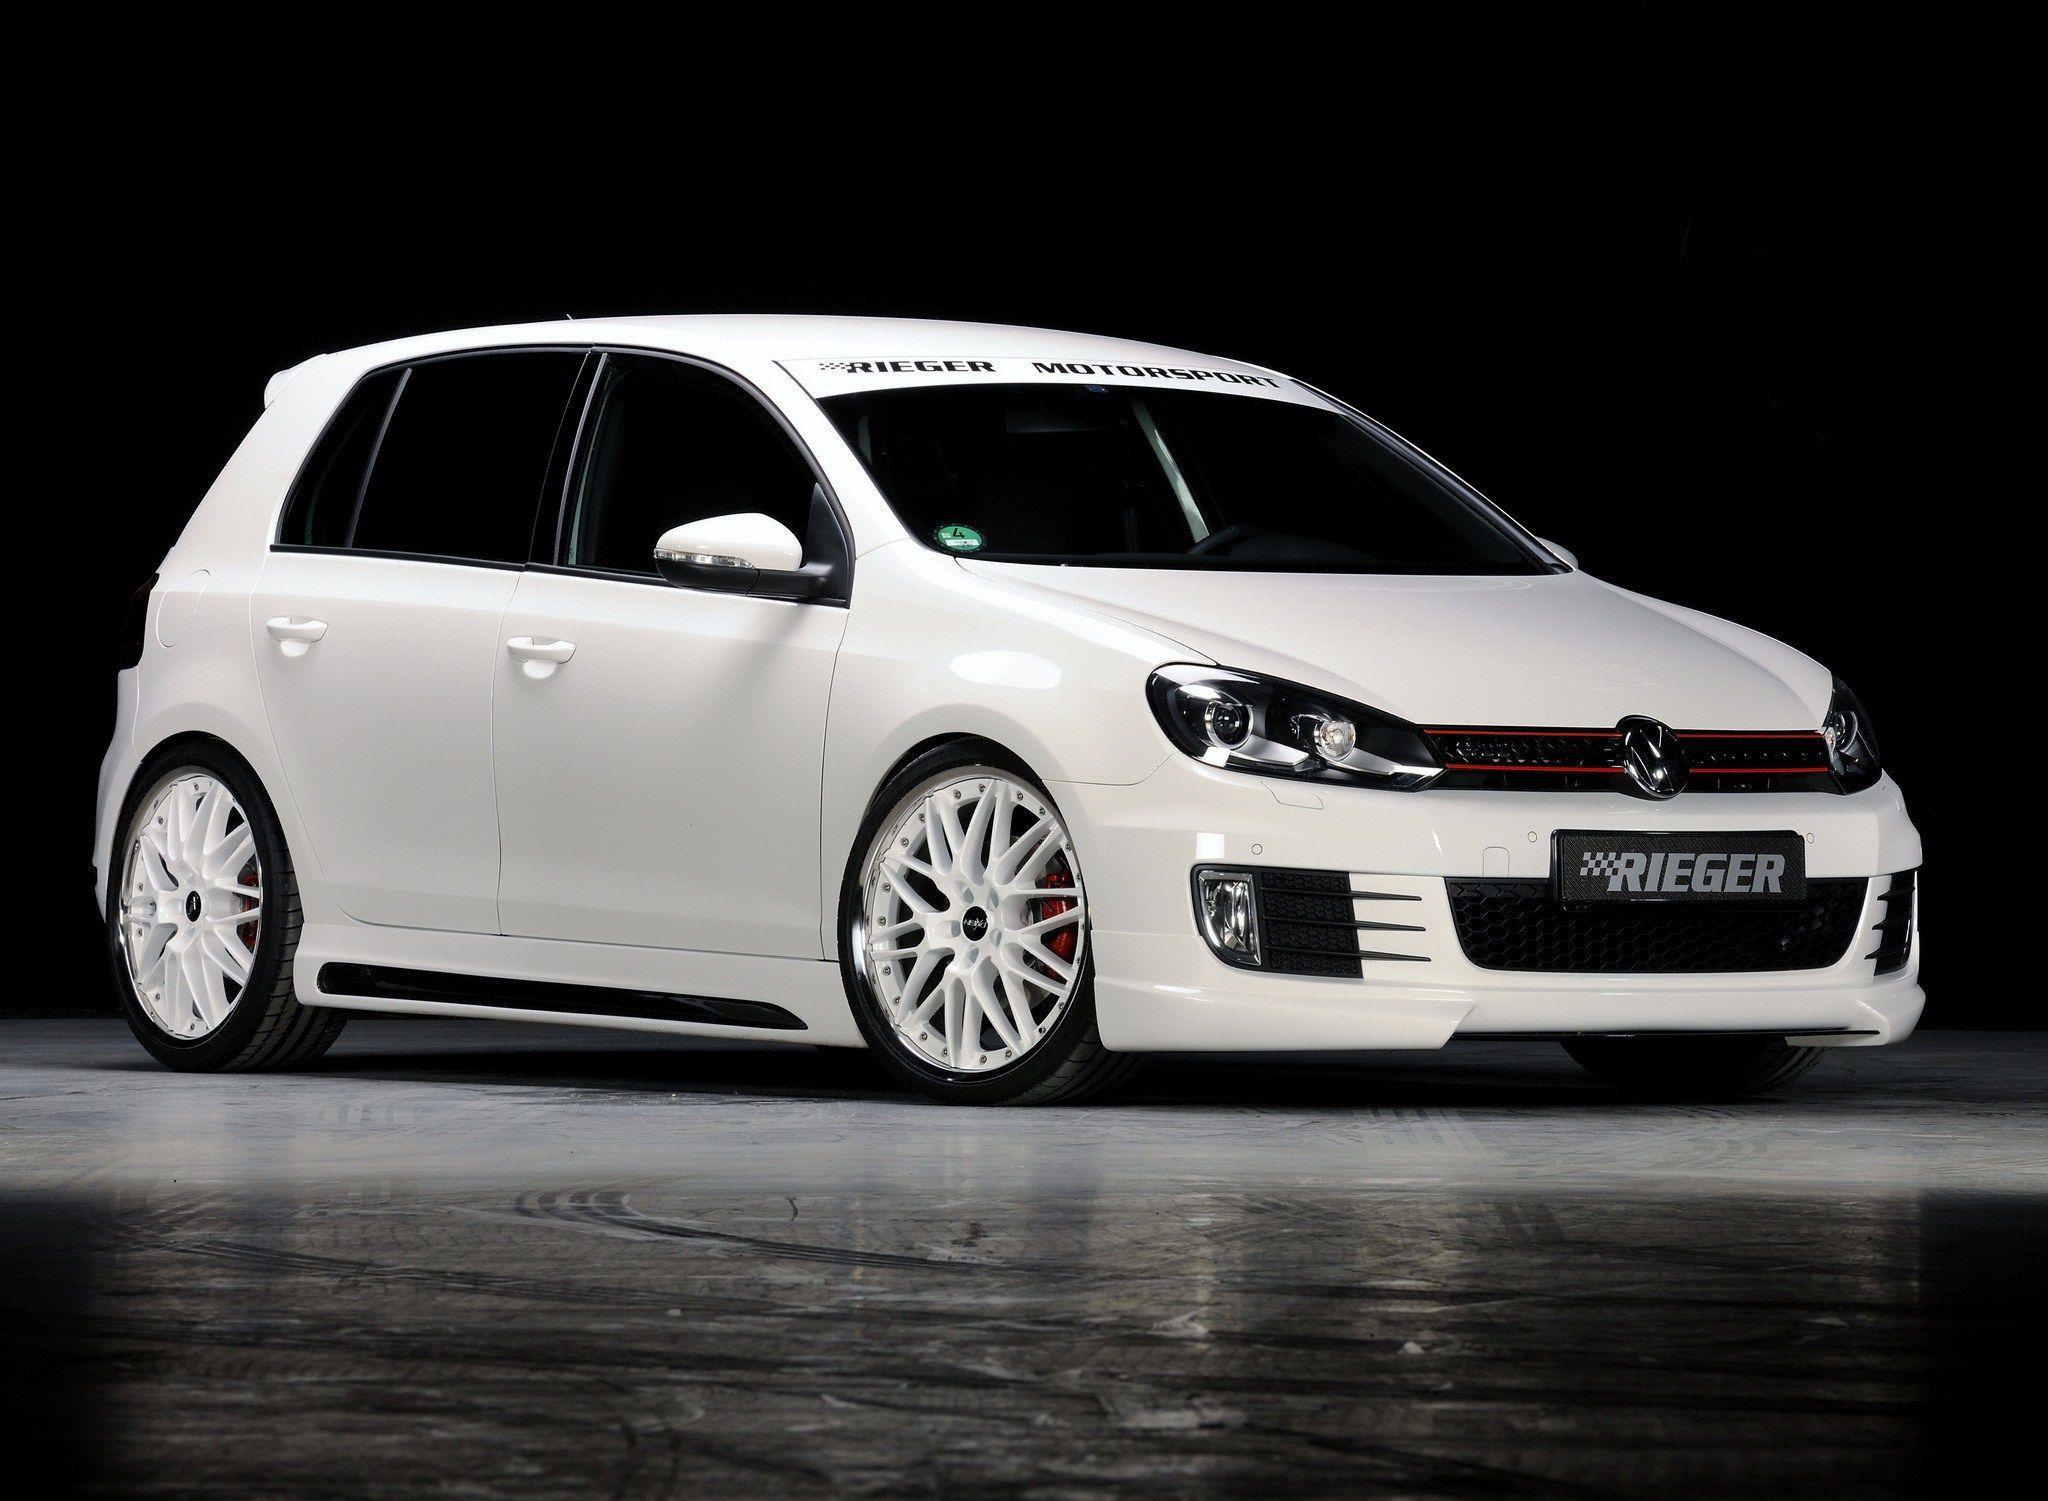 Jante Golf 7 Gti >> Volkswagen Golf GTI Wallpapers - Wallpaper Cave